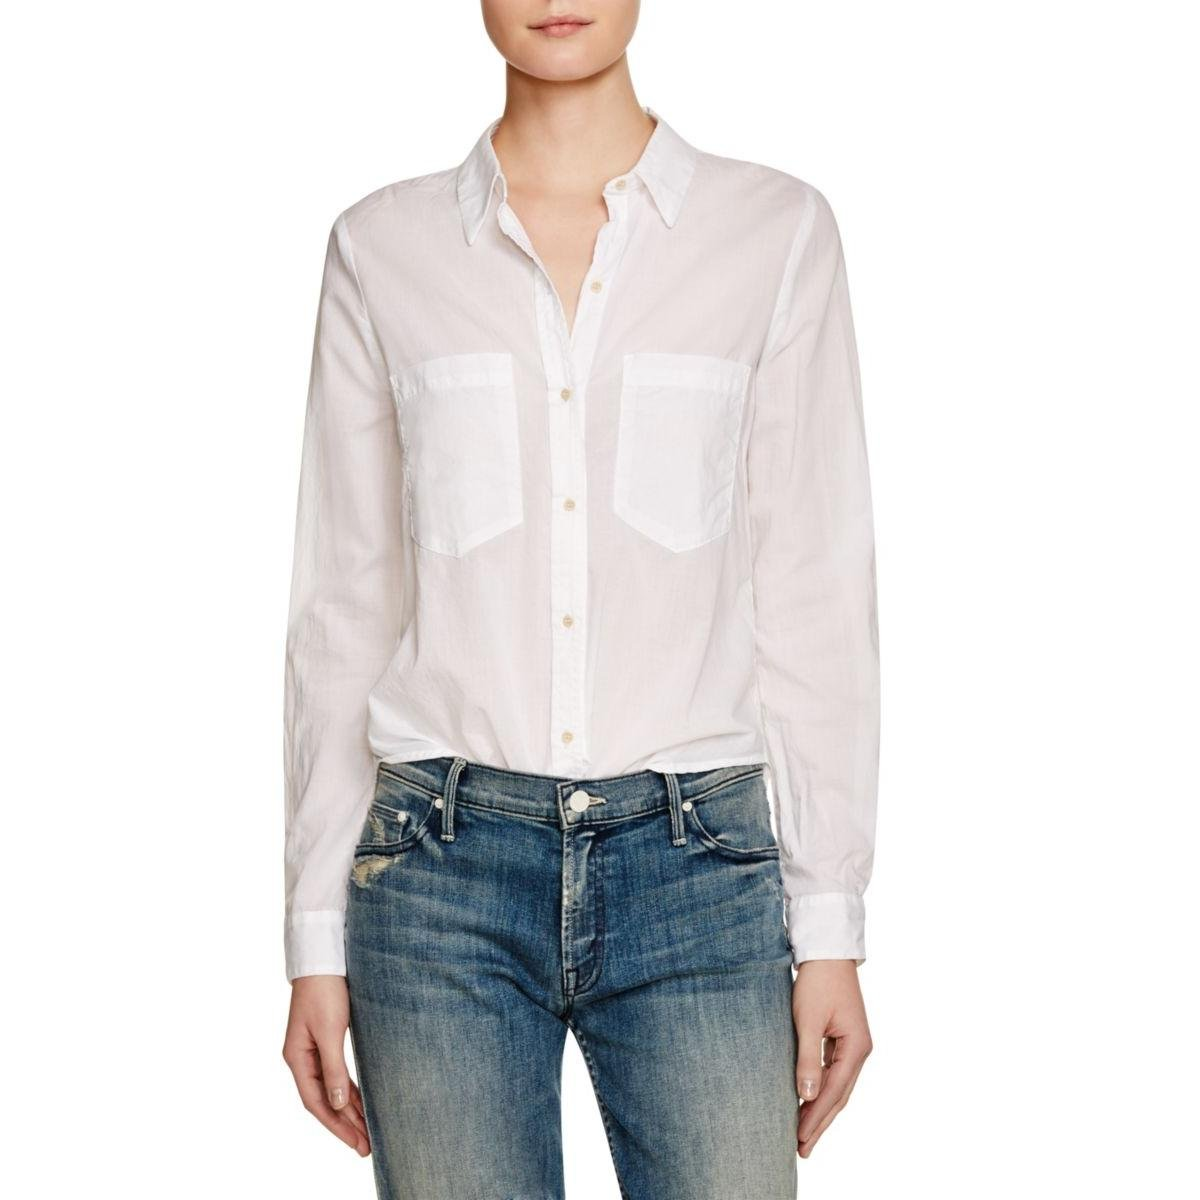 McGuire Denim Womens Sheer Long Sleeves Casual Top White XS